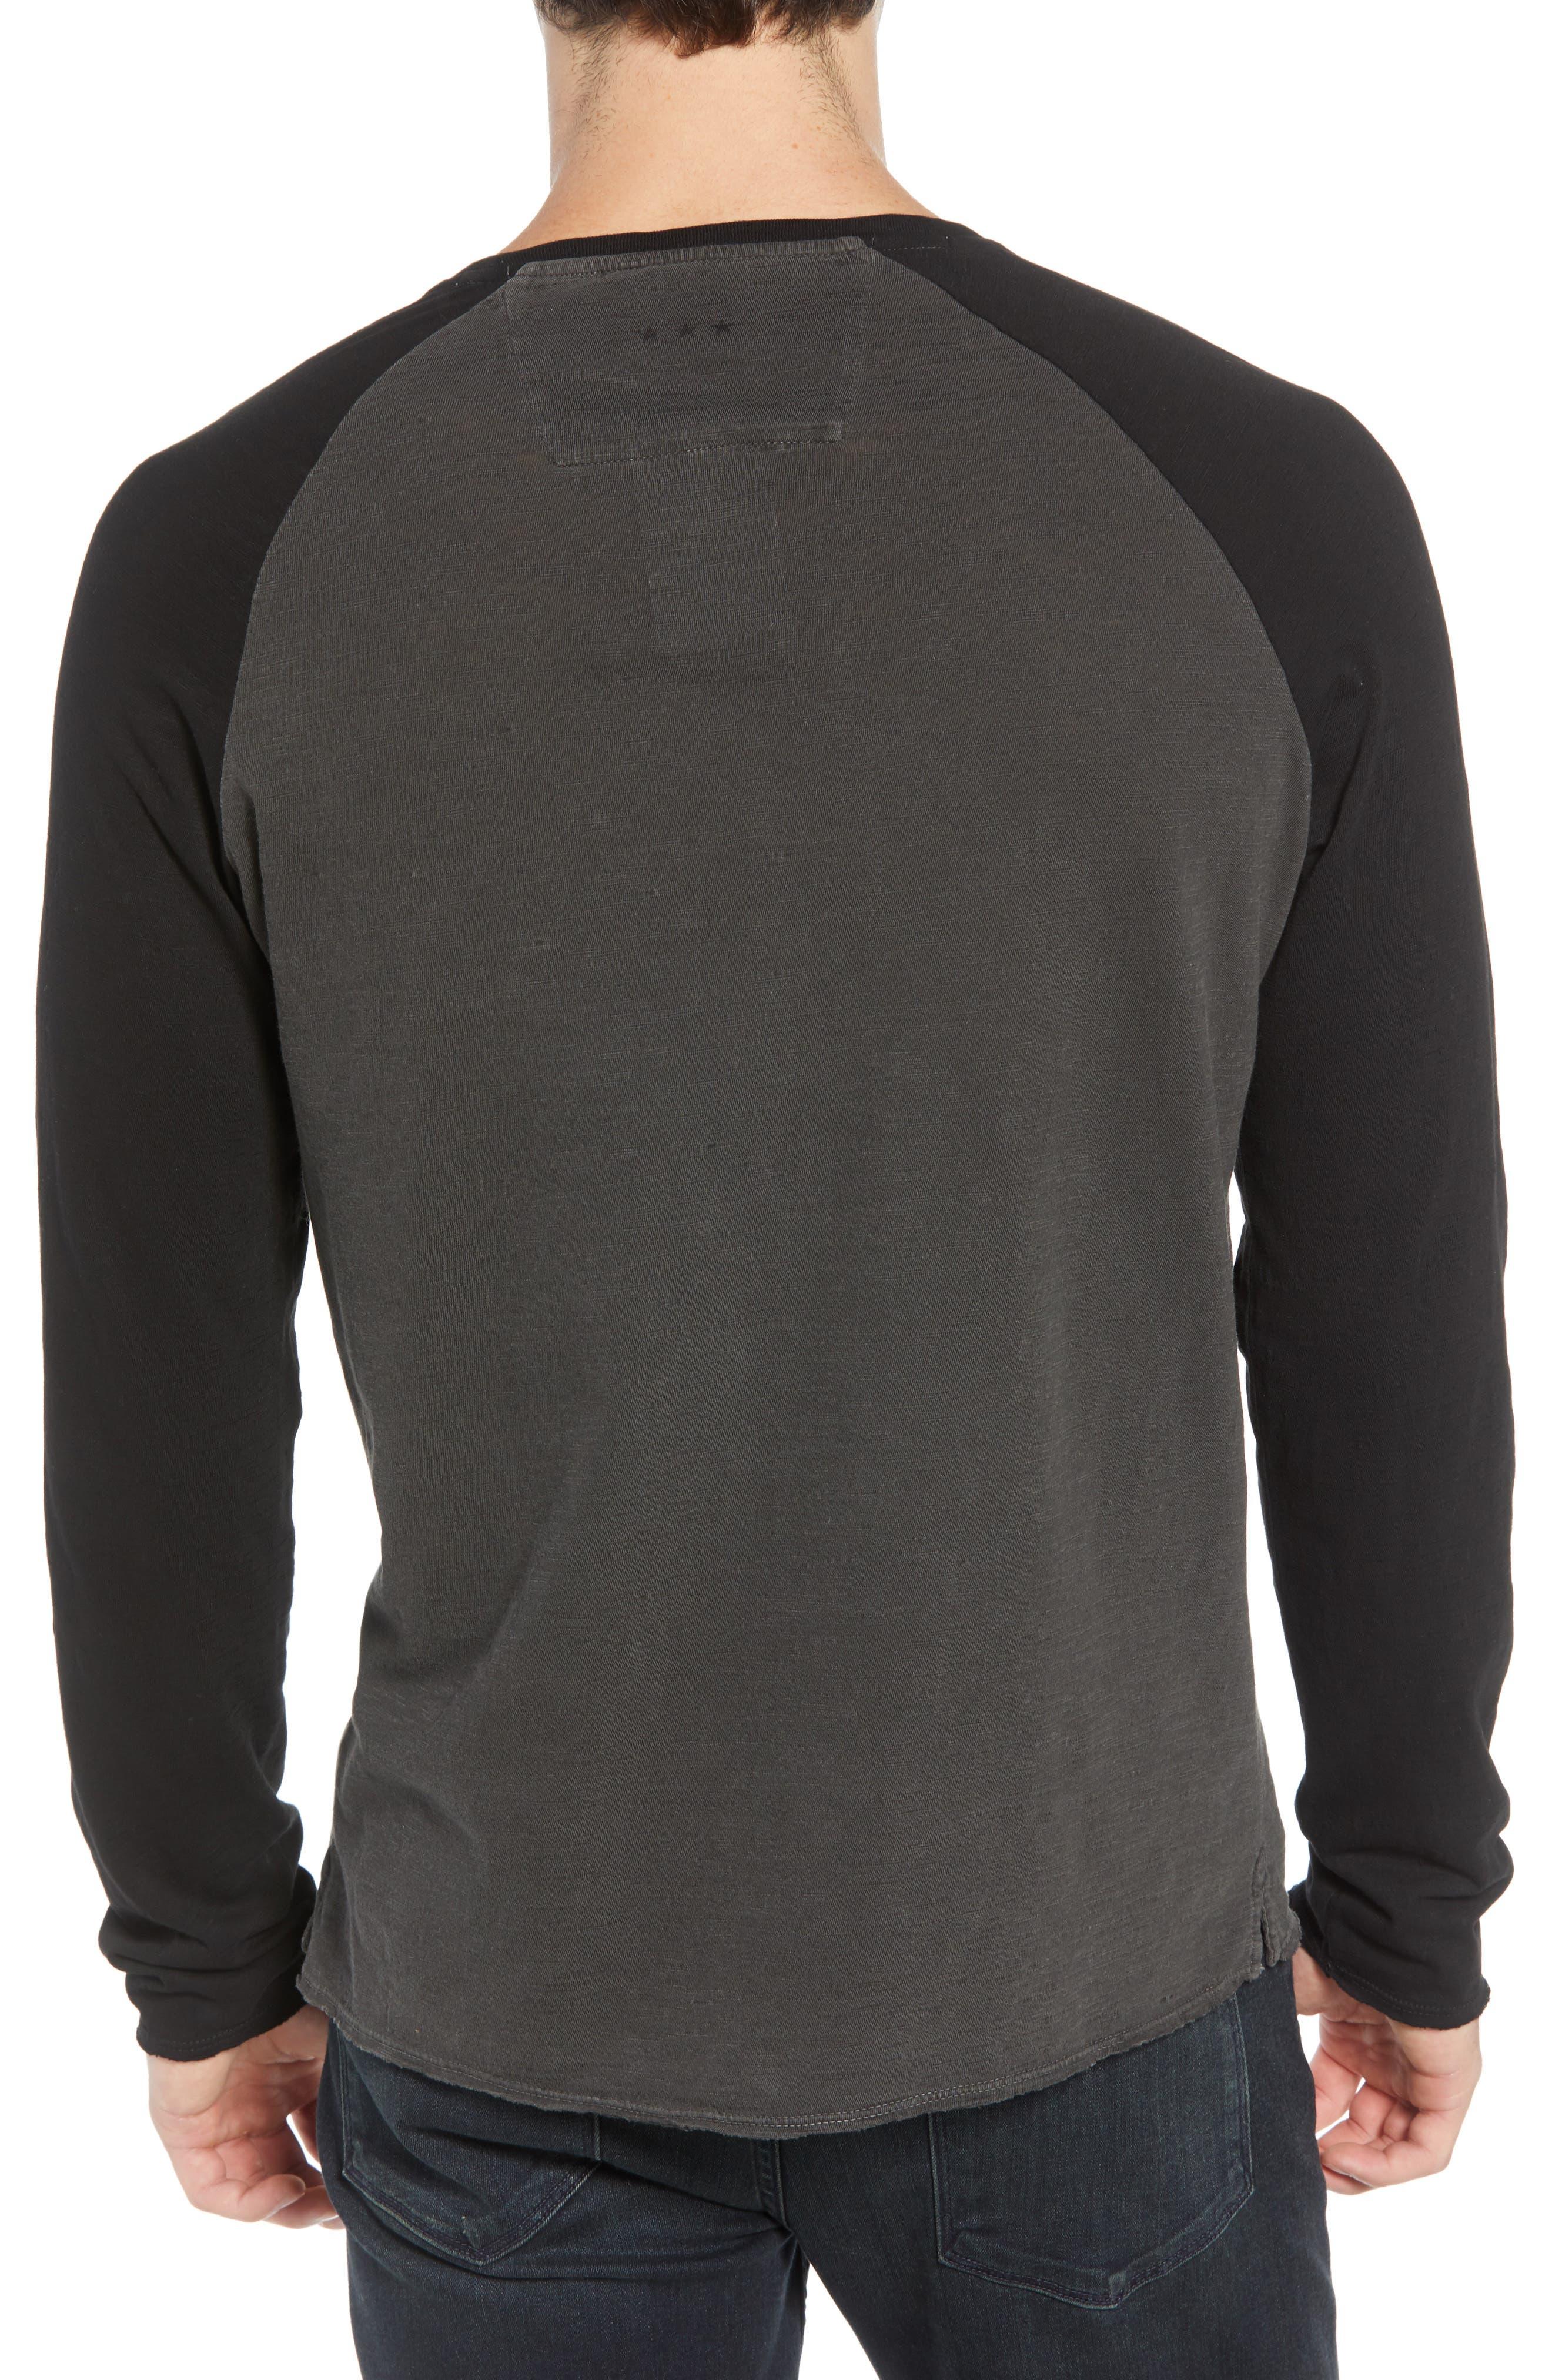 Motor City Long Sleeve T-Shirt,                             Alternate thumbnail 2, color,                             COAL